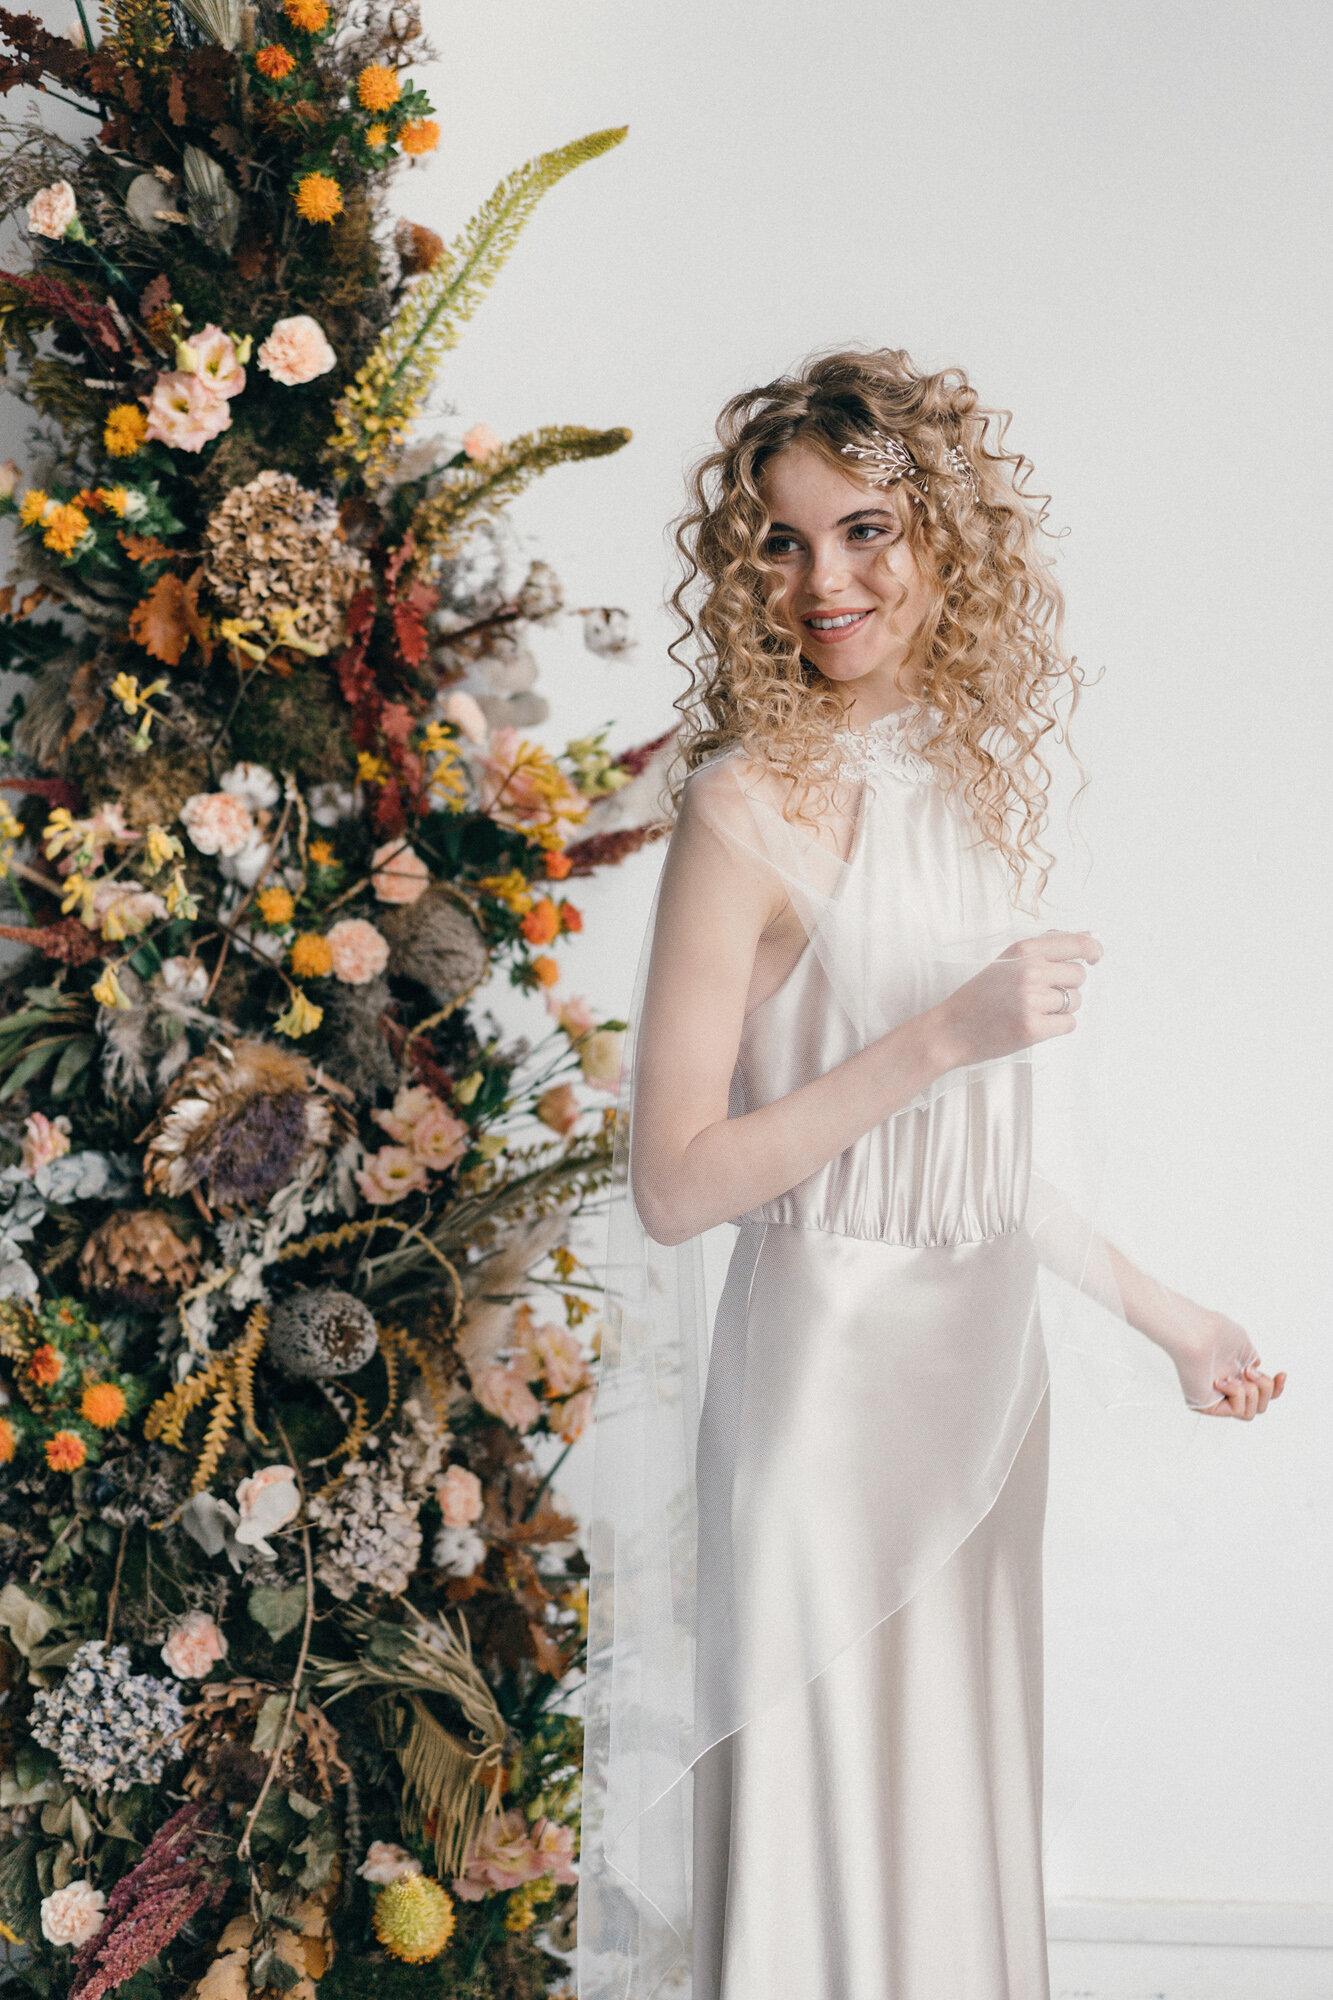 Debbie-Carlisle-Bridal-Accessories-Kate-Beaumont-Wedding-Gowns-Sheffield-Yorkshire-UK-12.jpg